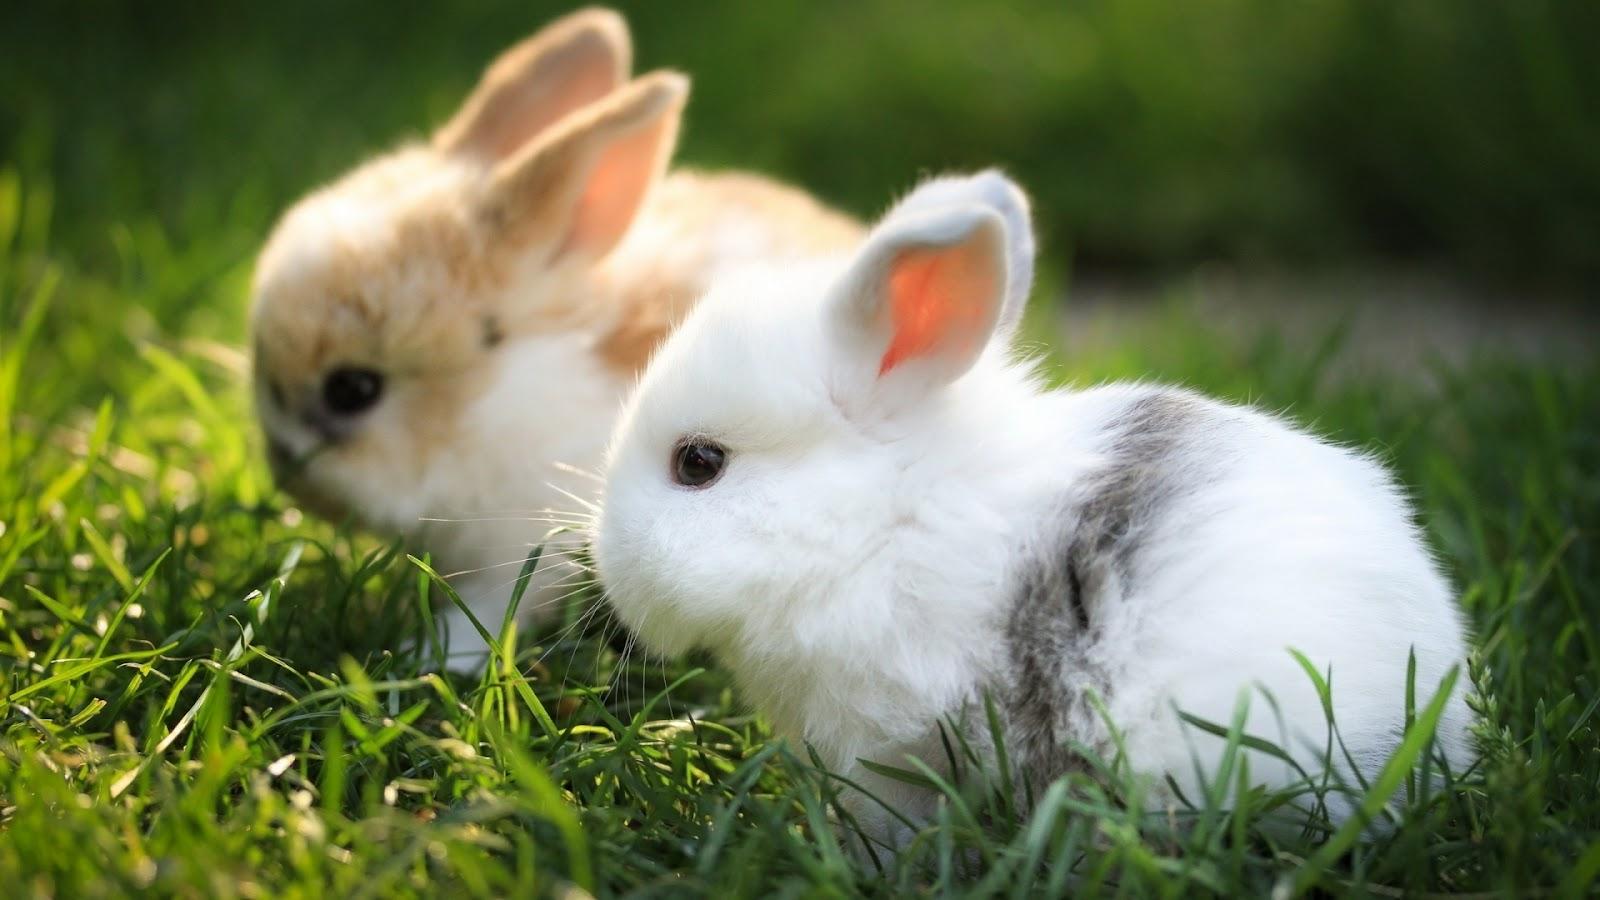 cute rabbit wallpaper - photo #1